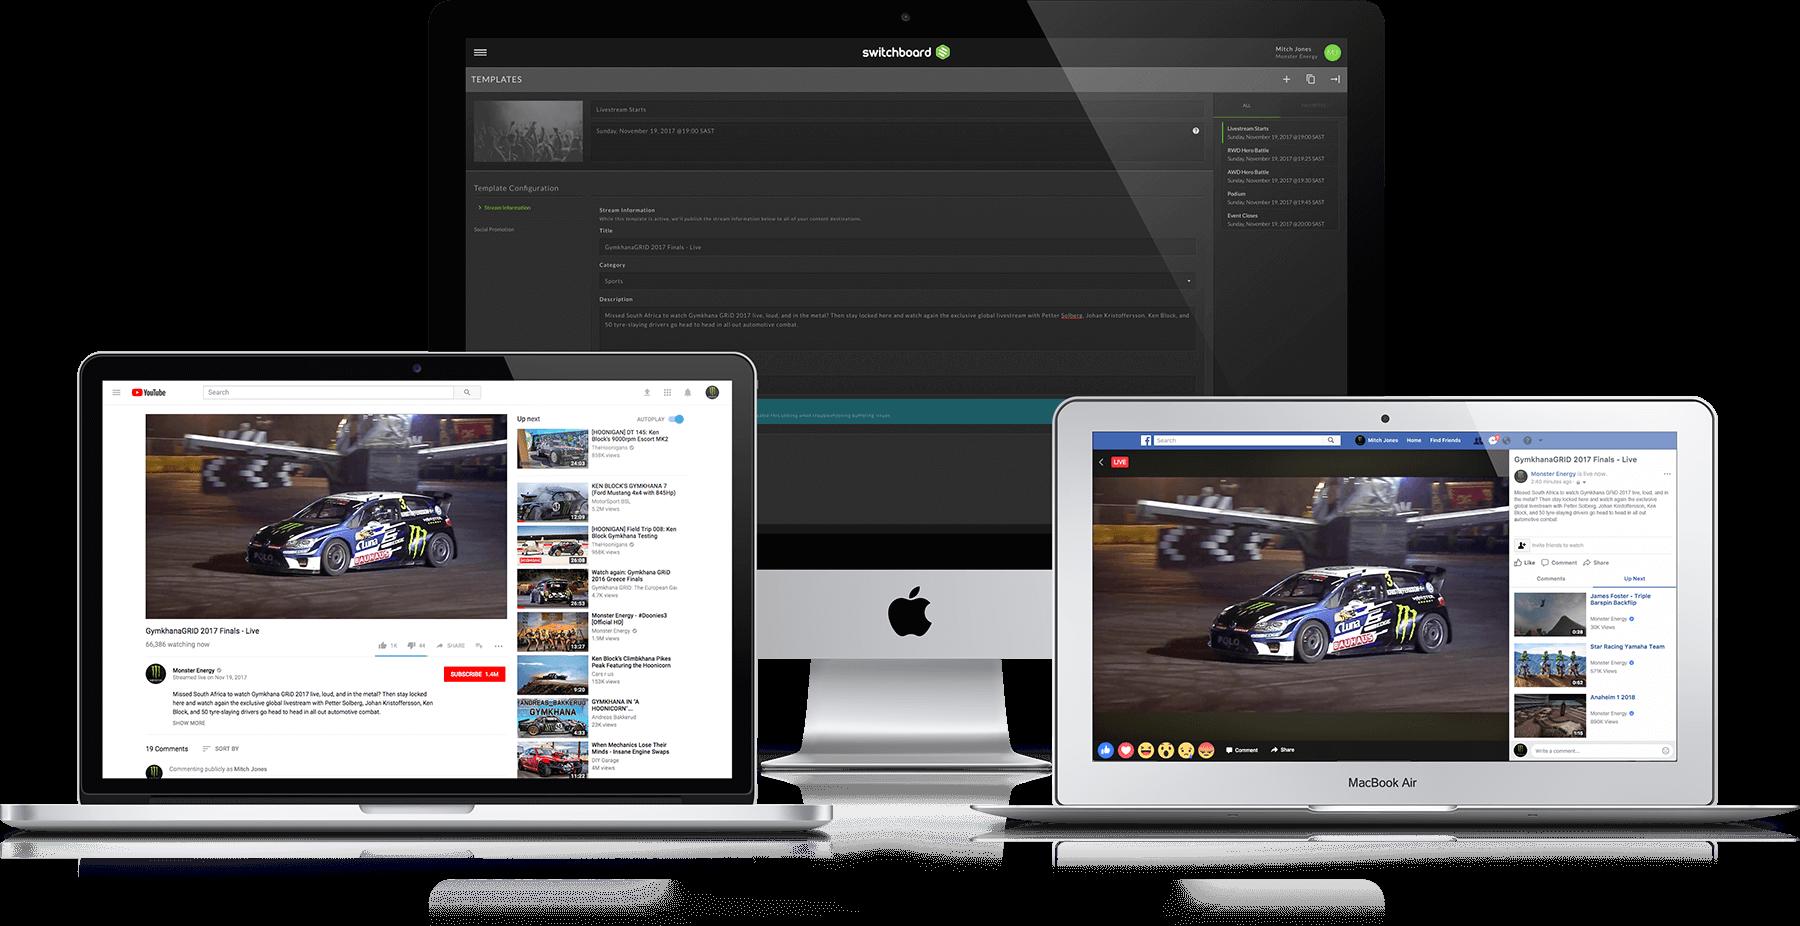 switchboard cloud facebook youtube platform